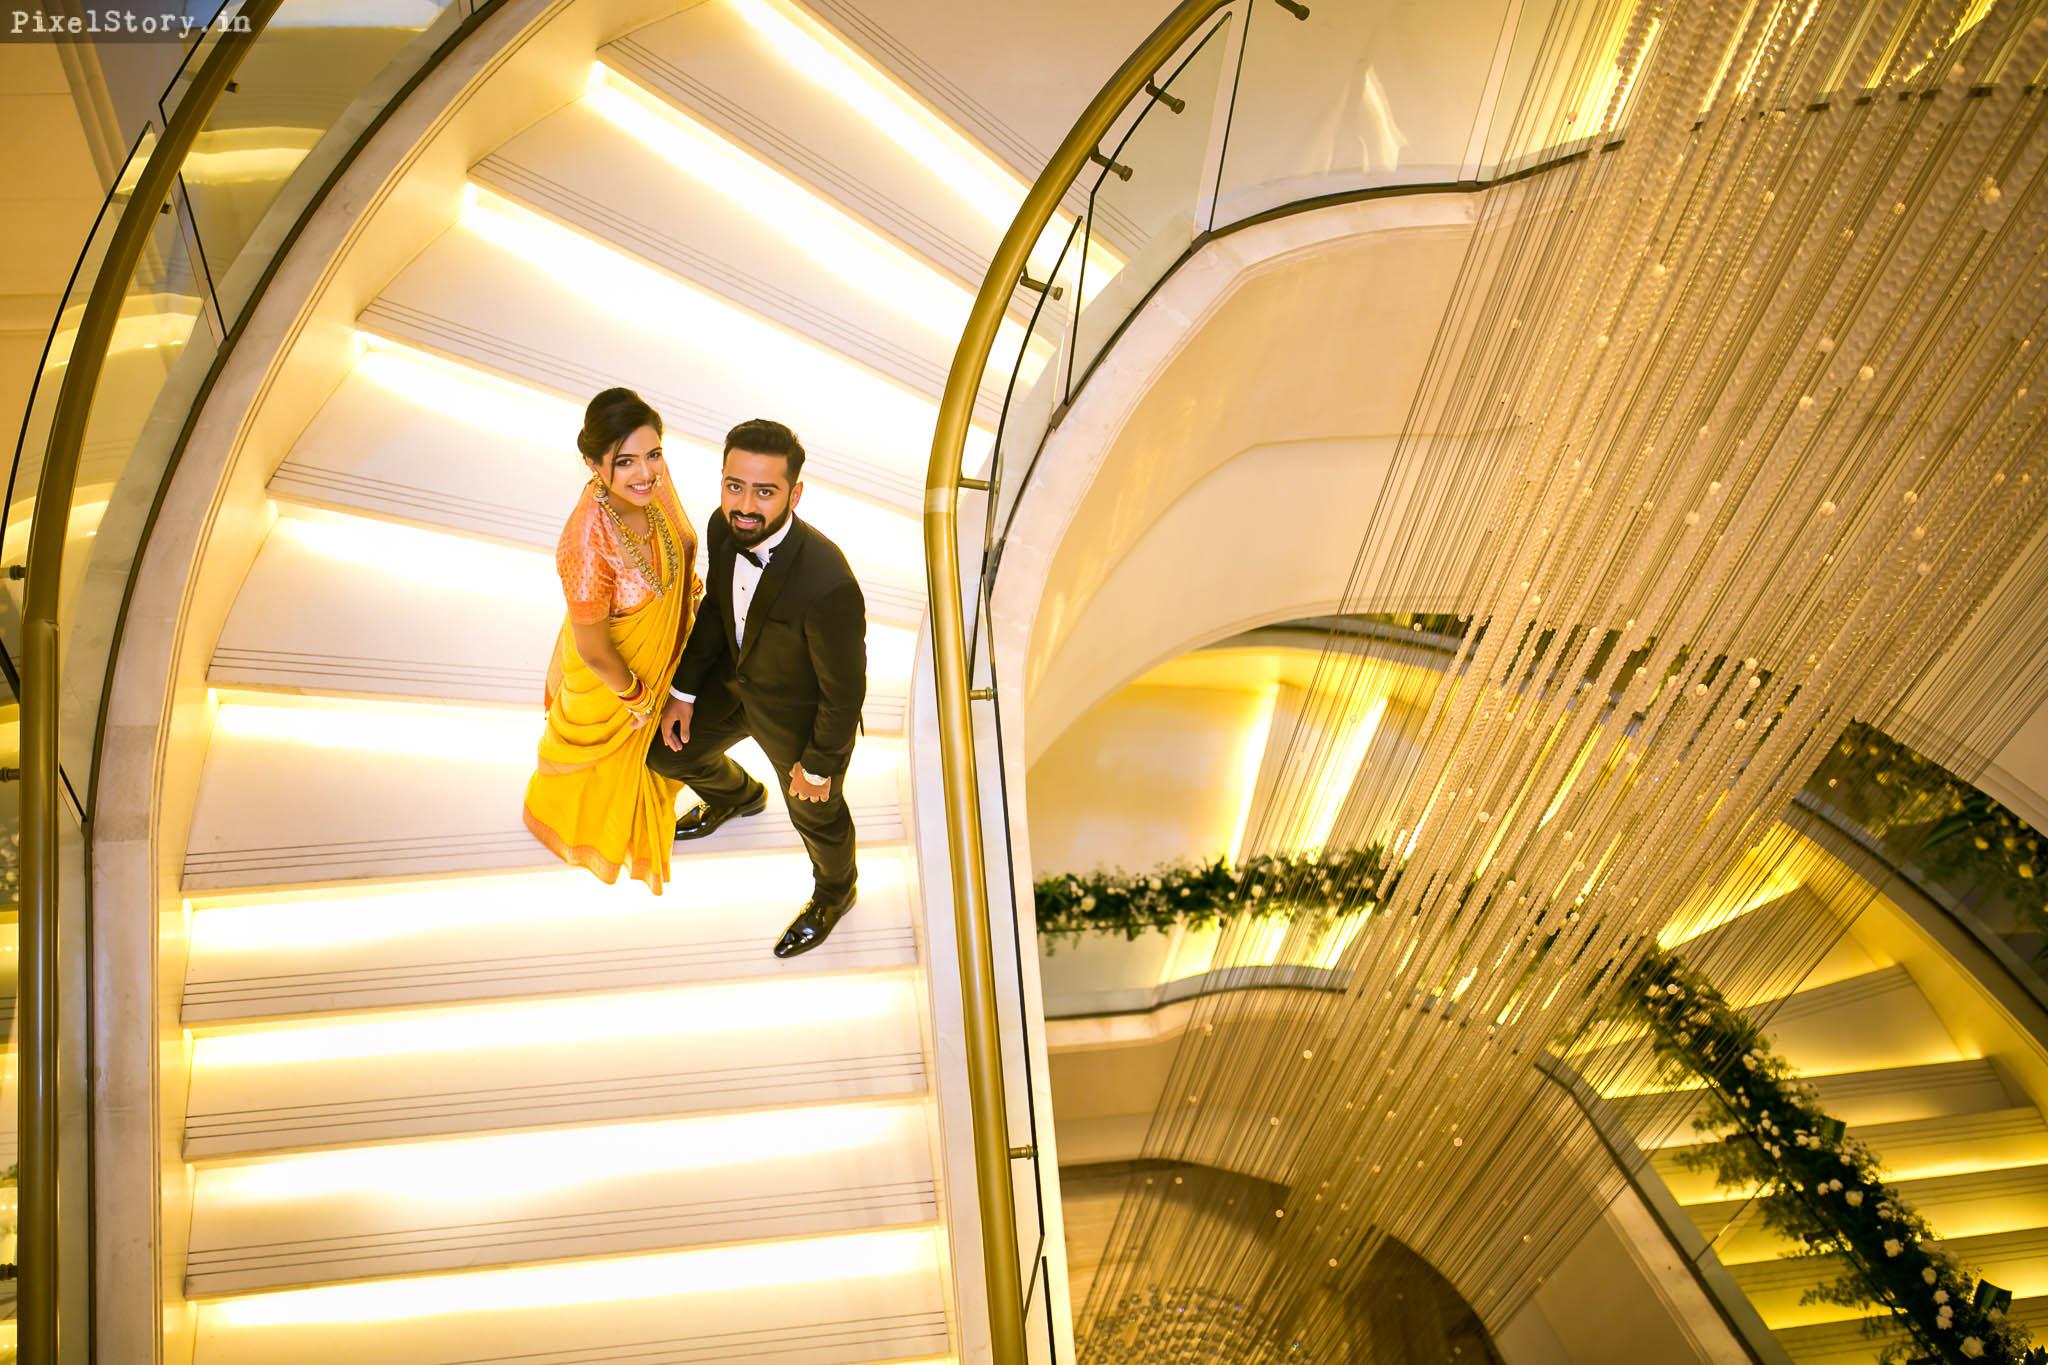 PixelStory-Engagement-Ritz-Carlton-Preksha-Bharath-004.jpg